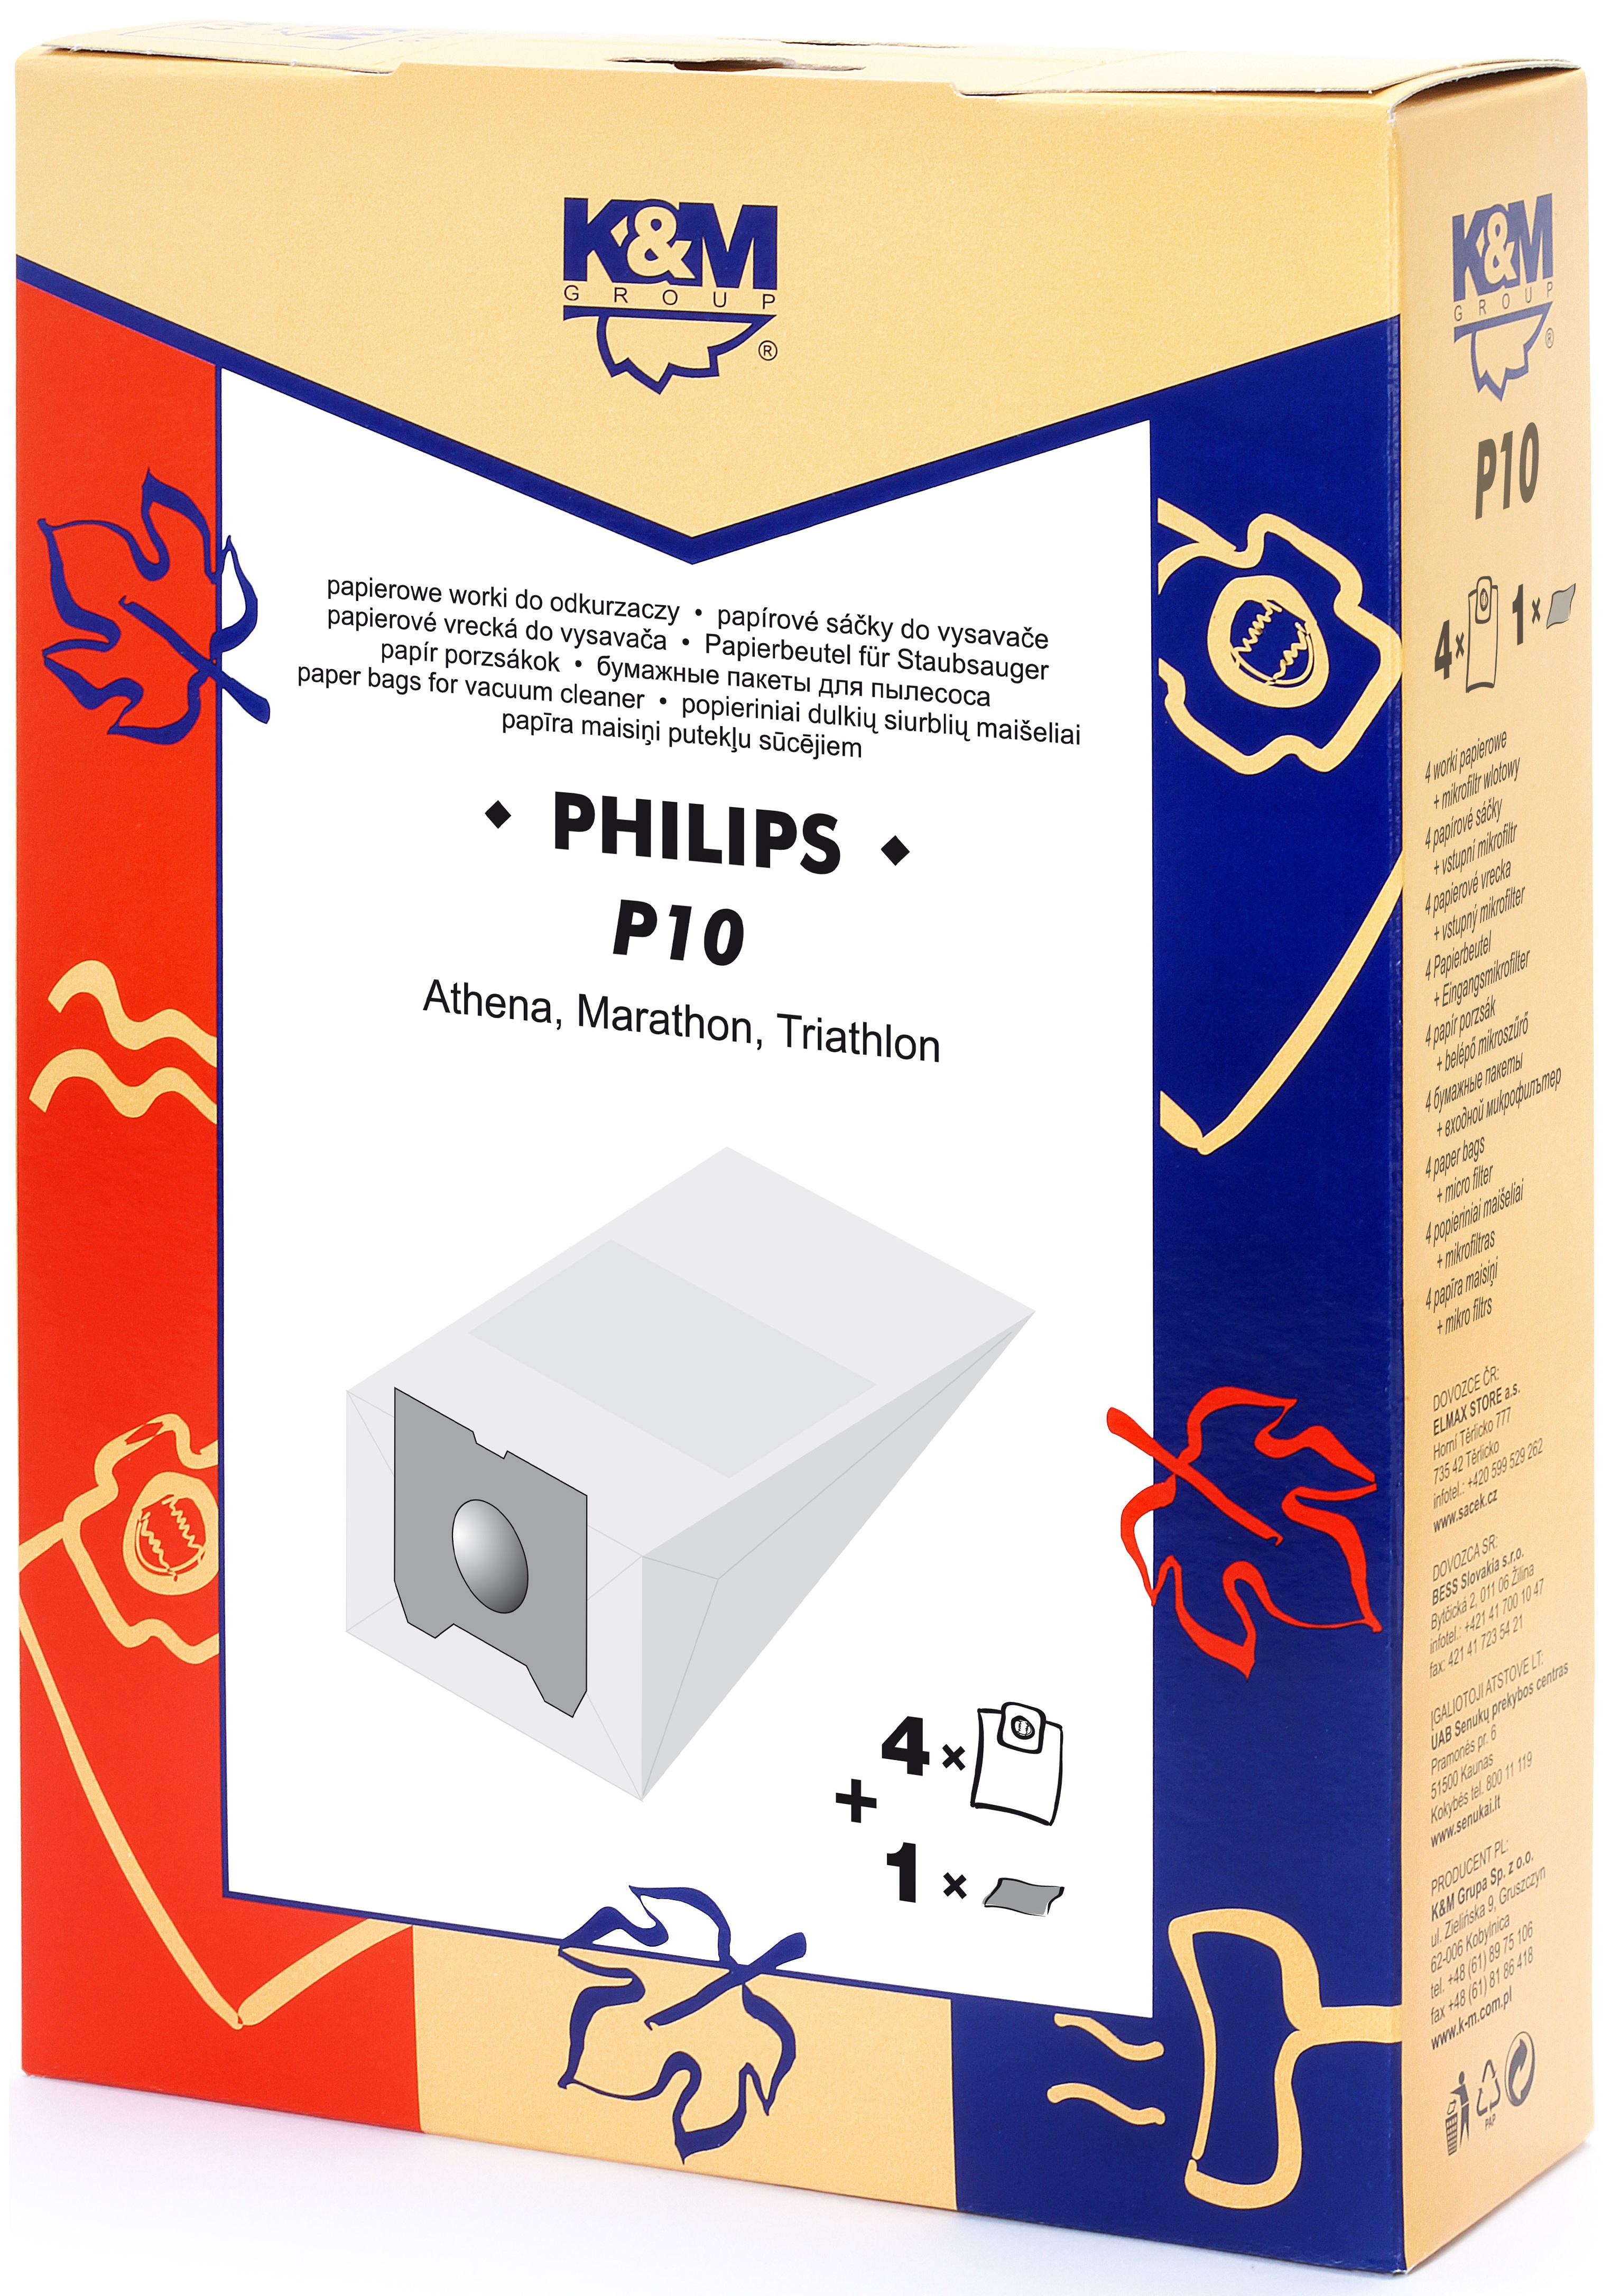 Sac aspirator Philips Athena, hartie, 4X saci + 1X filtru, K&M 0